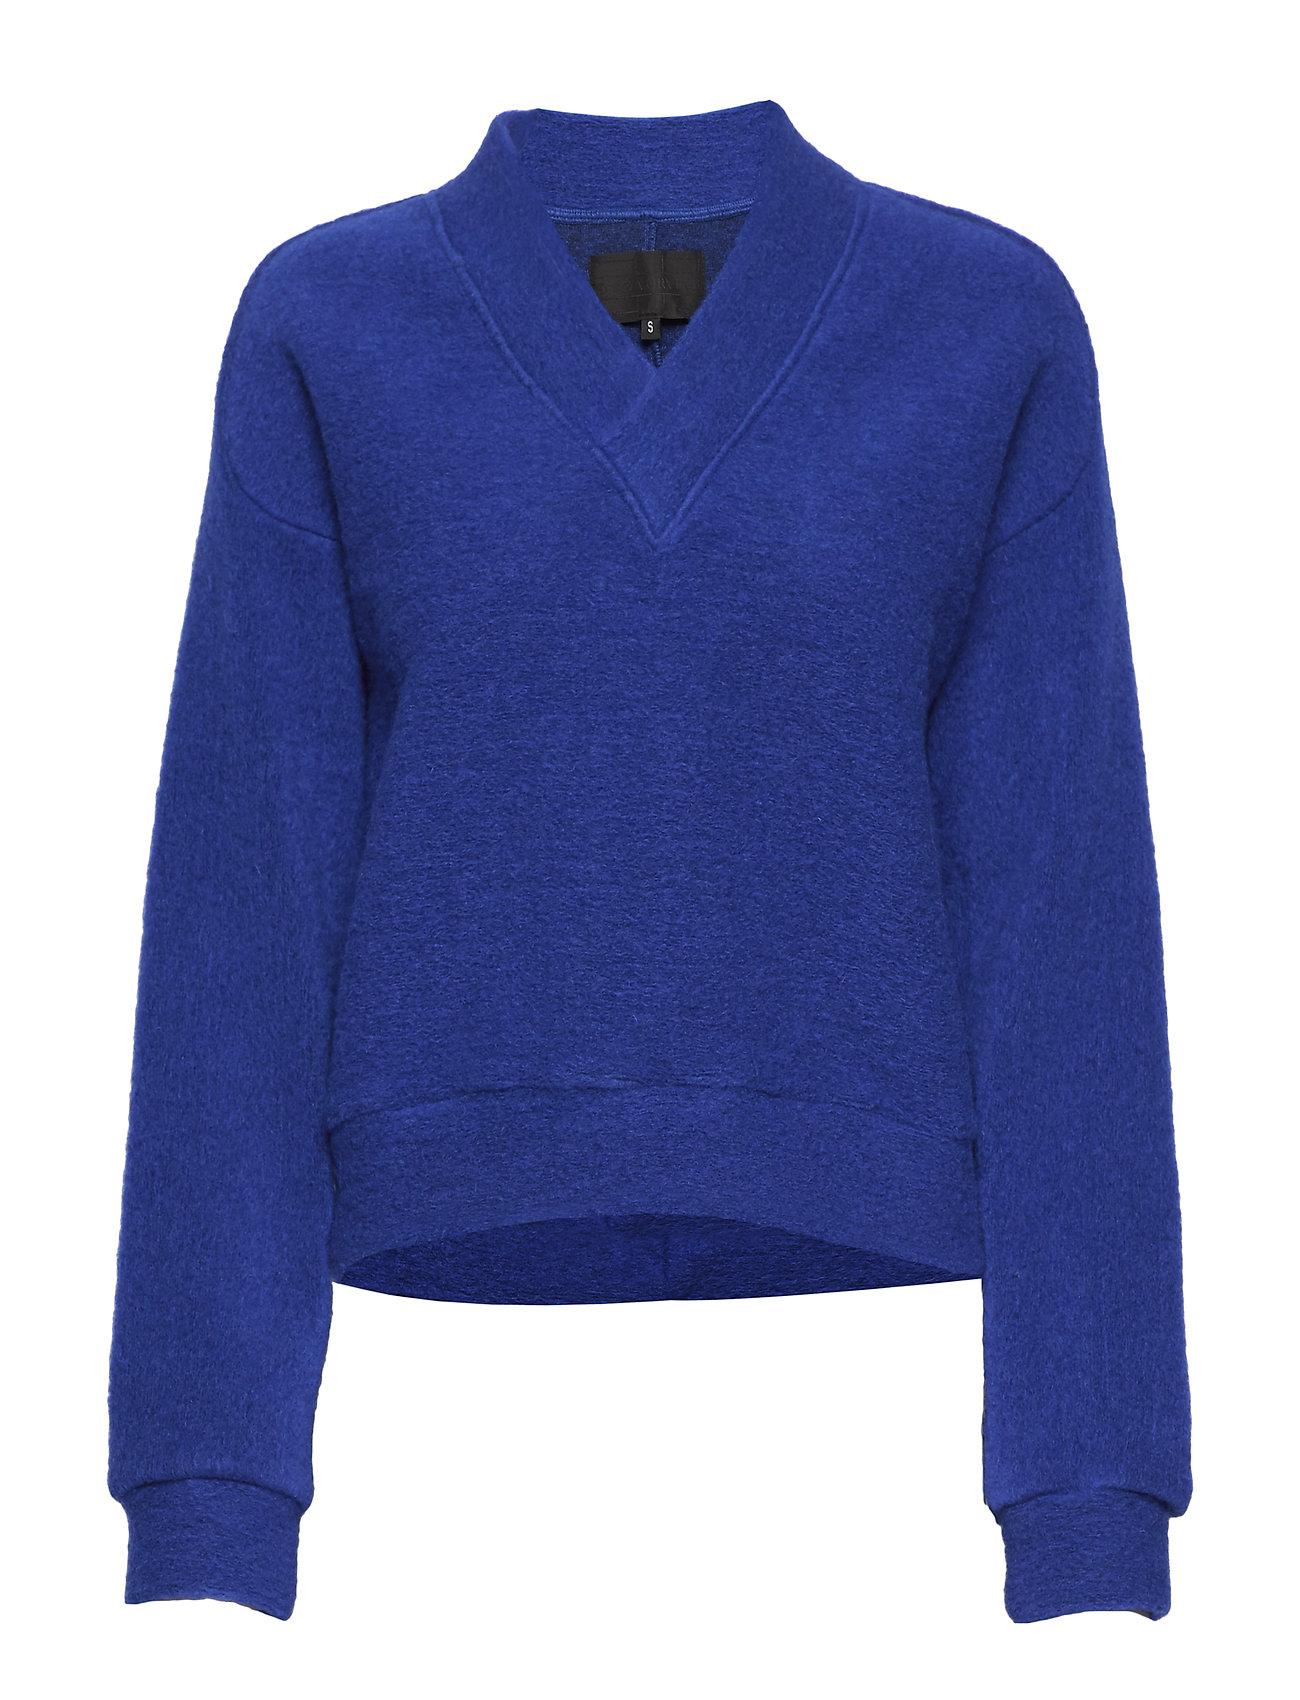 sweaterblueDiana sweaterblueDiana V Orving sweaterblueDiana V Orving sweaterblueDiana Orving Orving V V pGSqUzMV